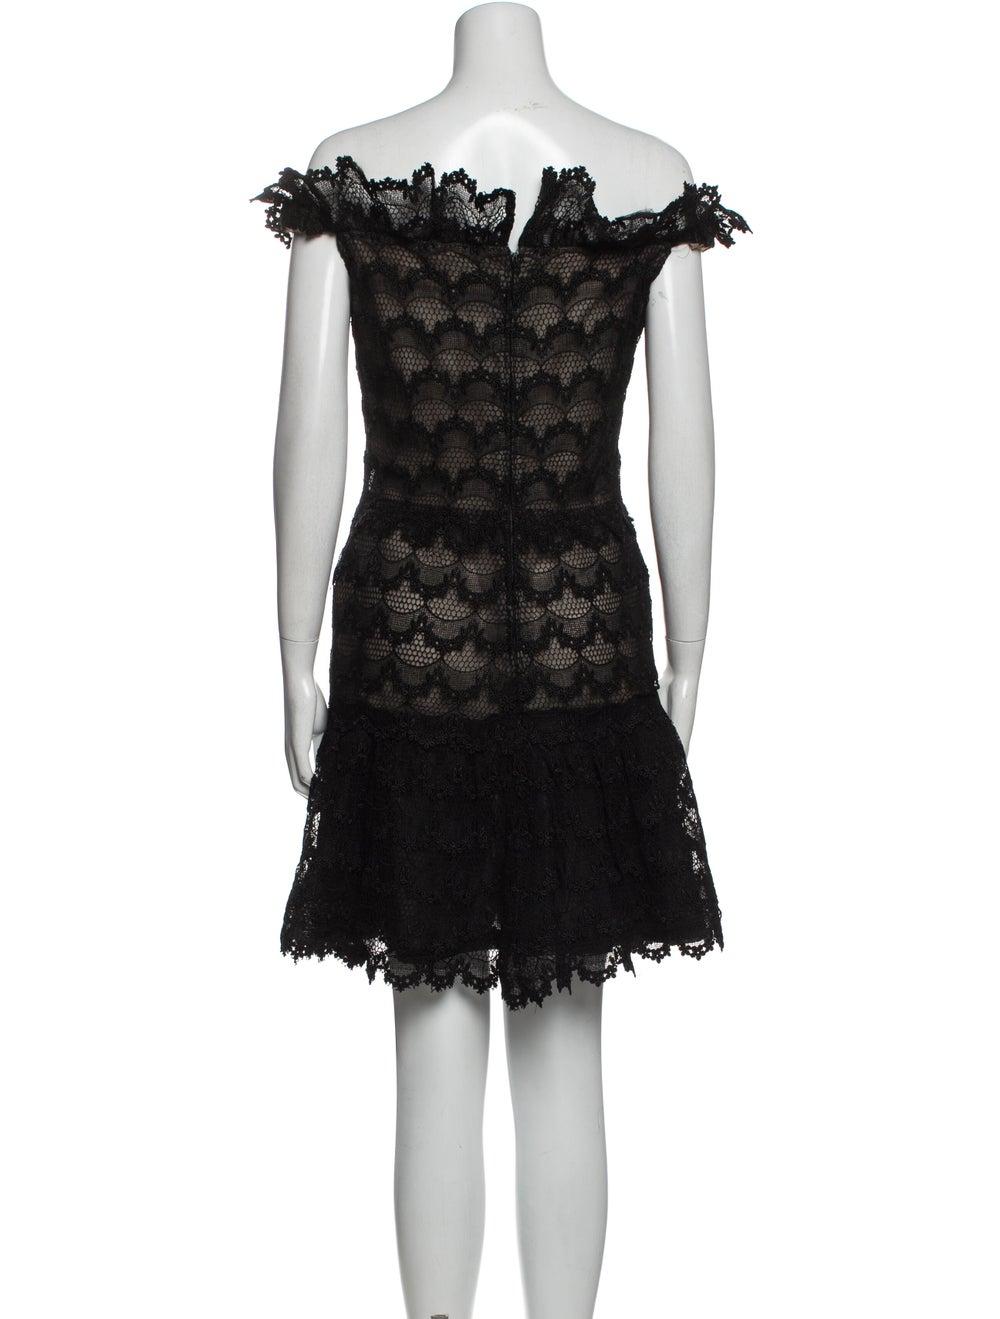 Arnold Scaasi Cowl Neck Mini Dress Black - image 3